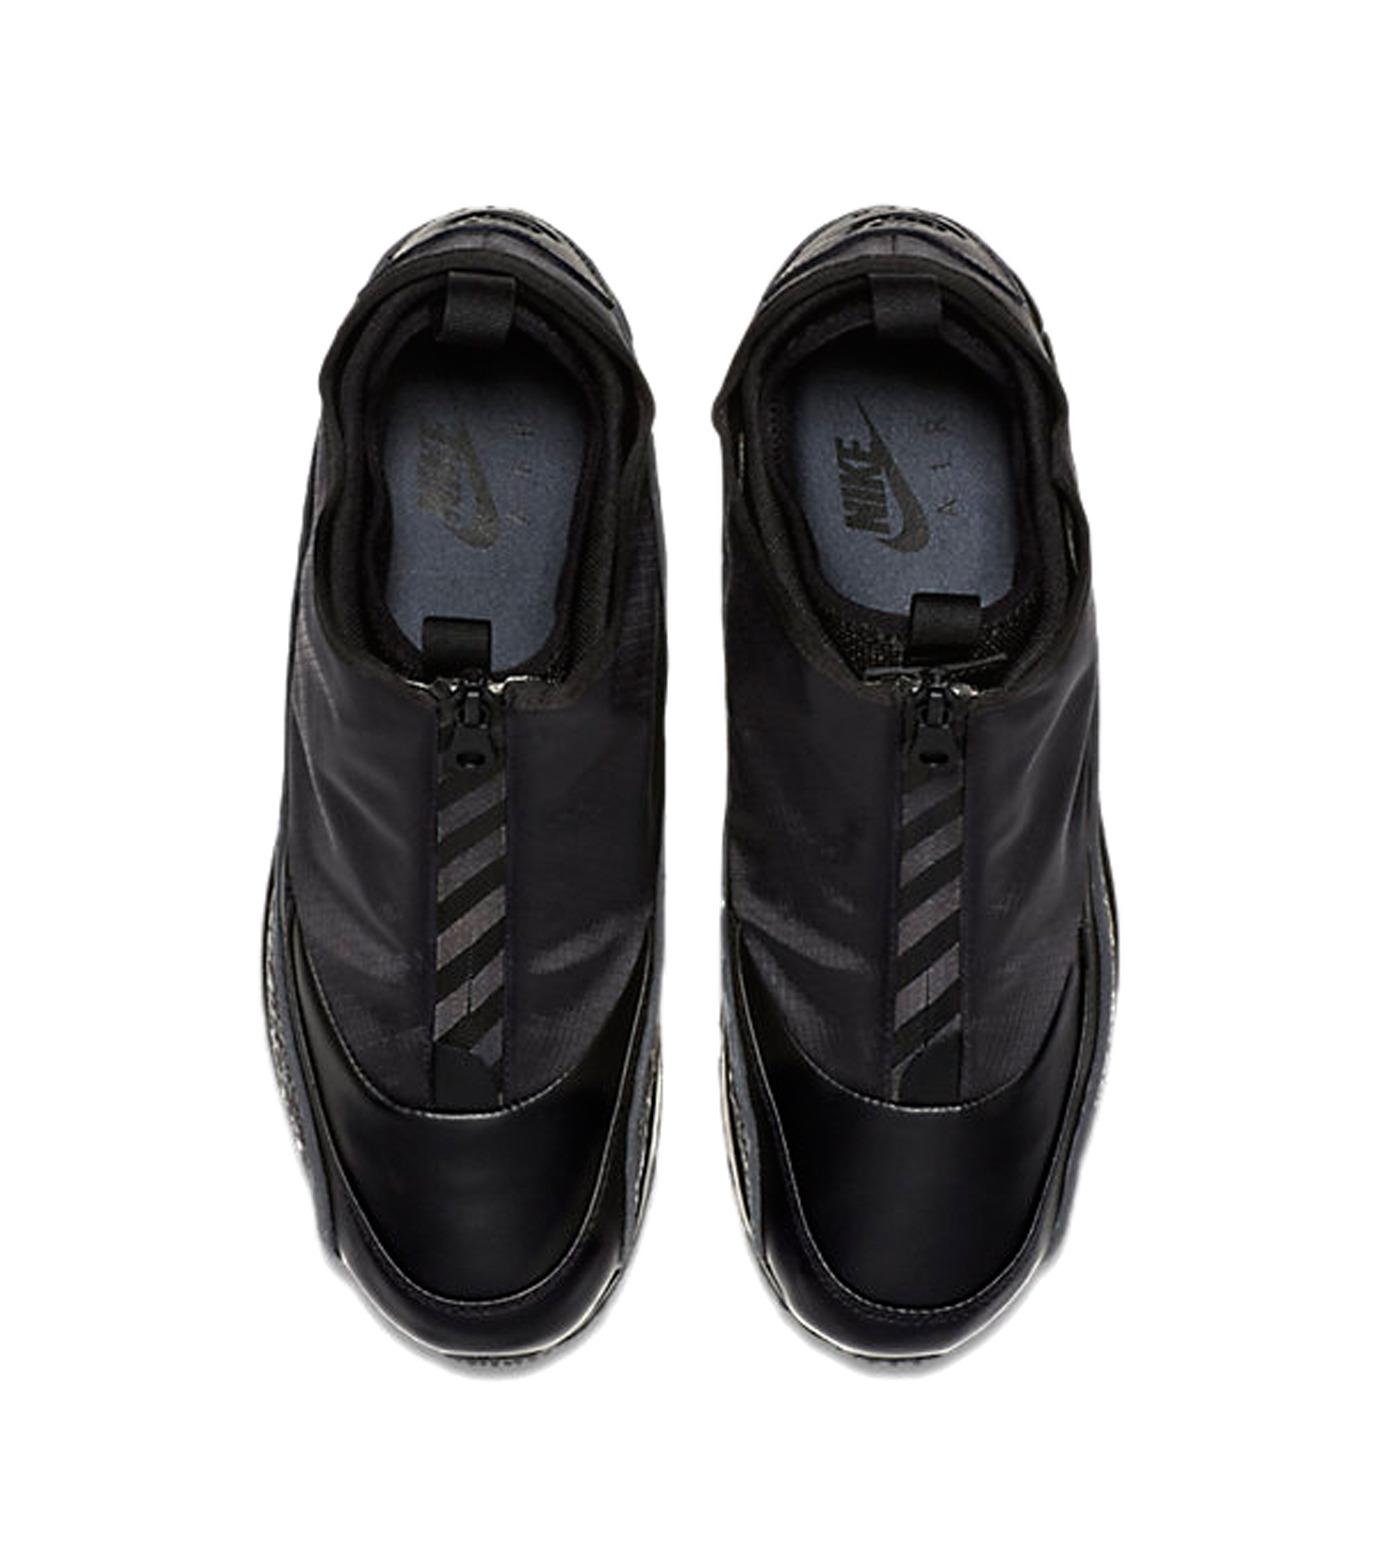 NIKE(ナイキ)のAIR MAX 90 UTILITY-BLACK(シューズ/shoes)-858956-001-13 拡大詳細画像4